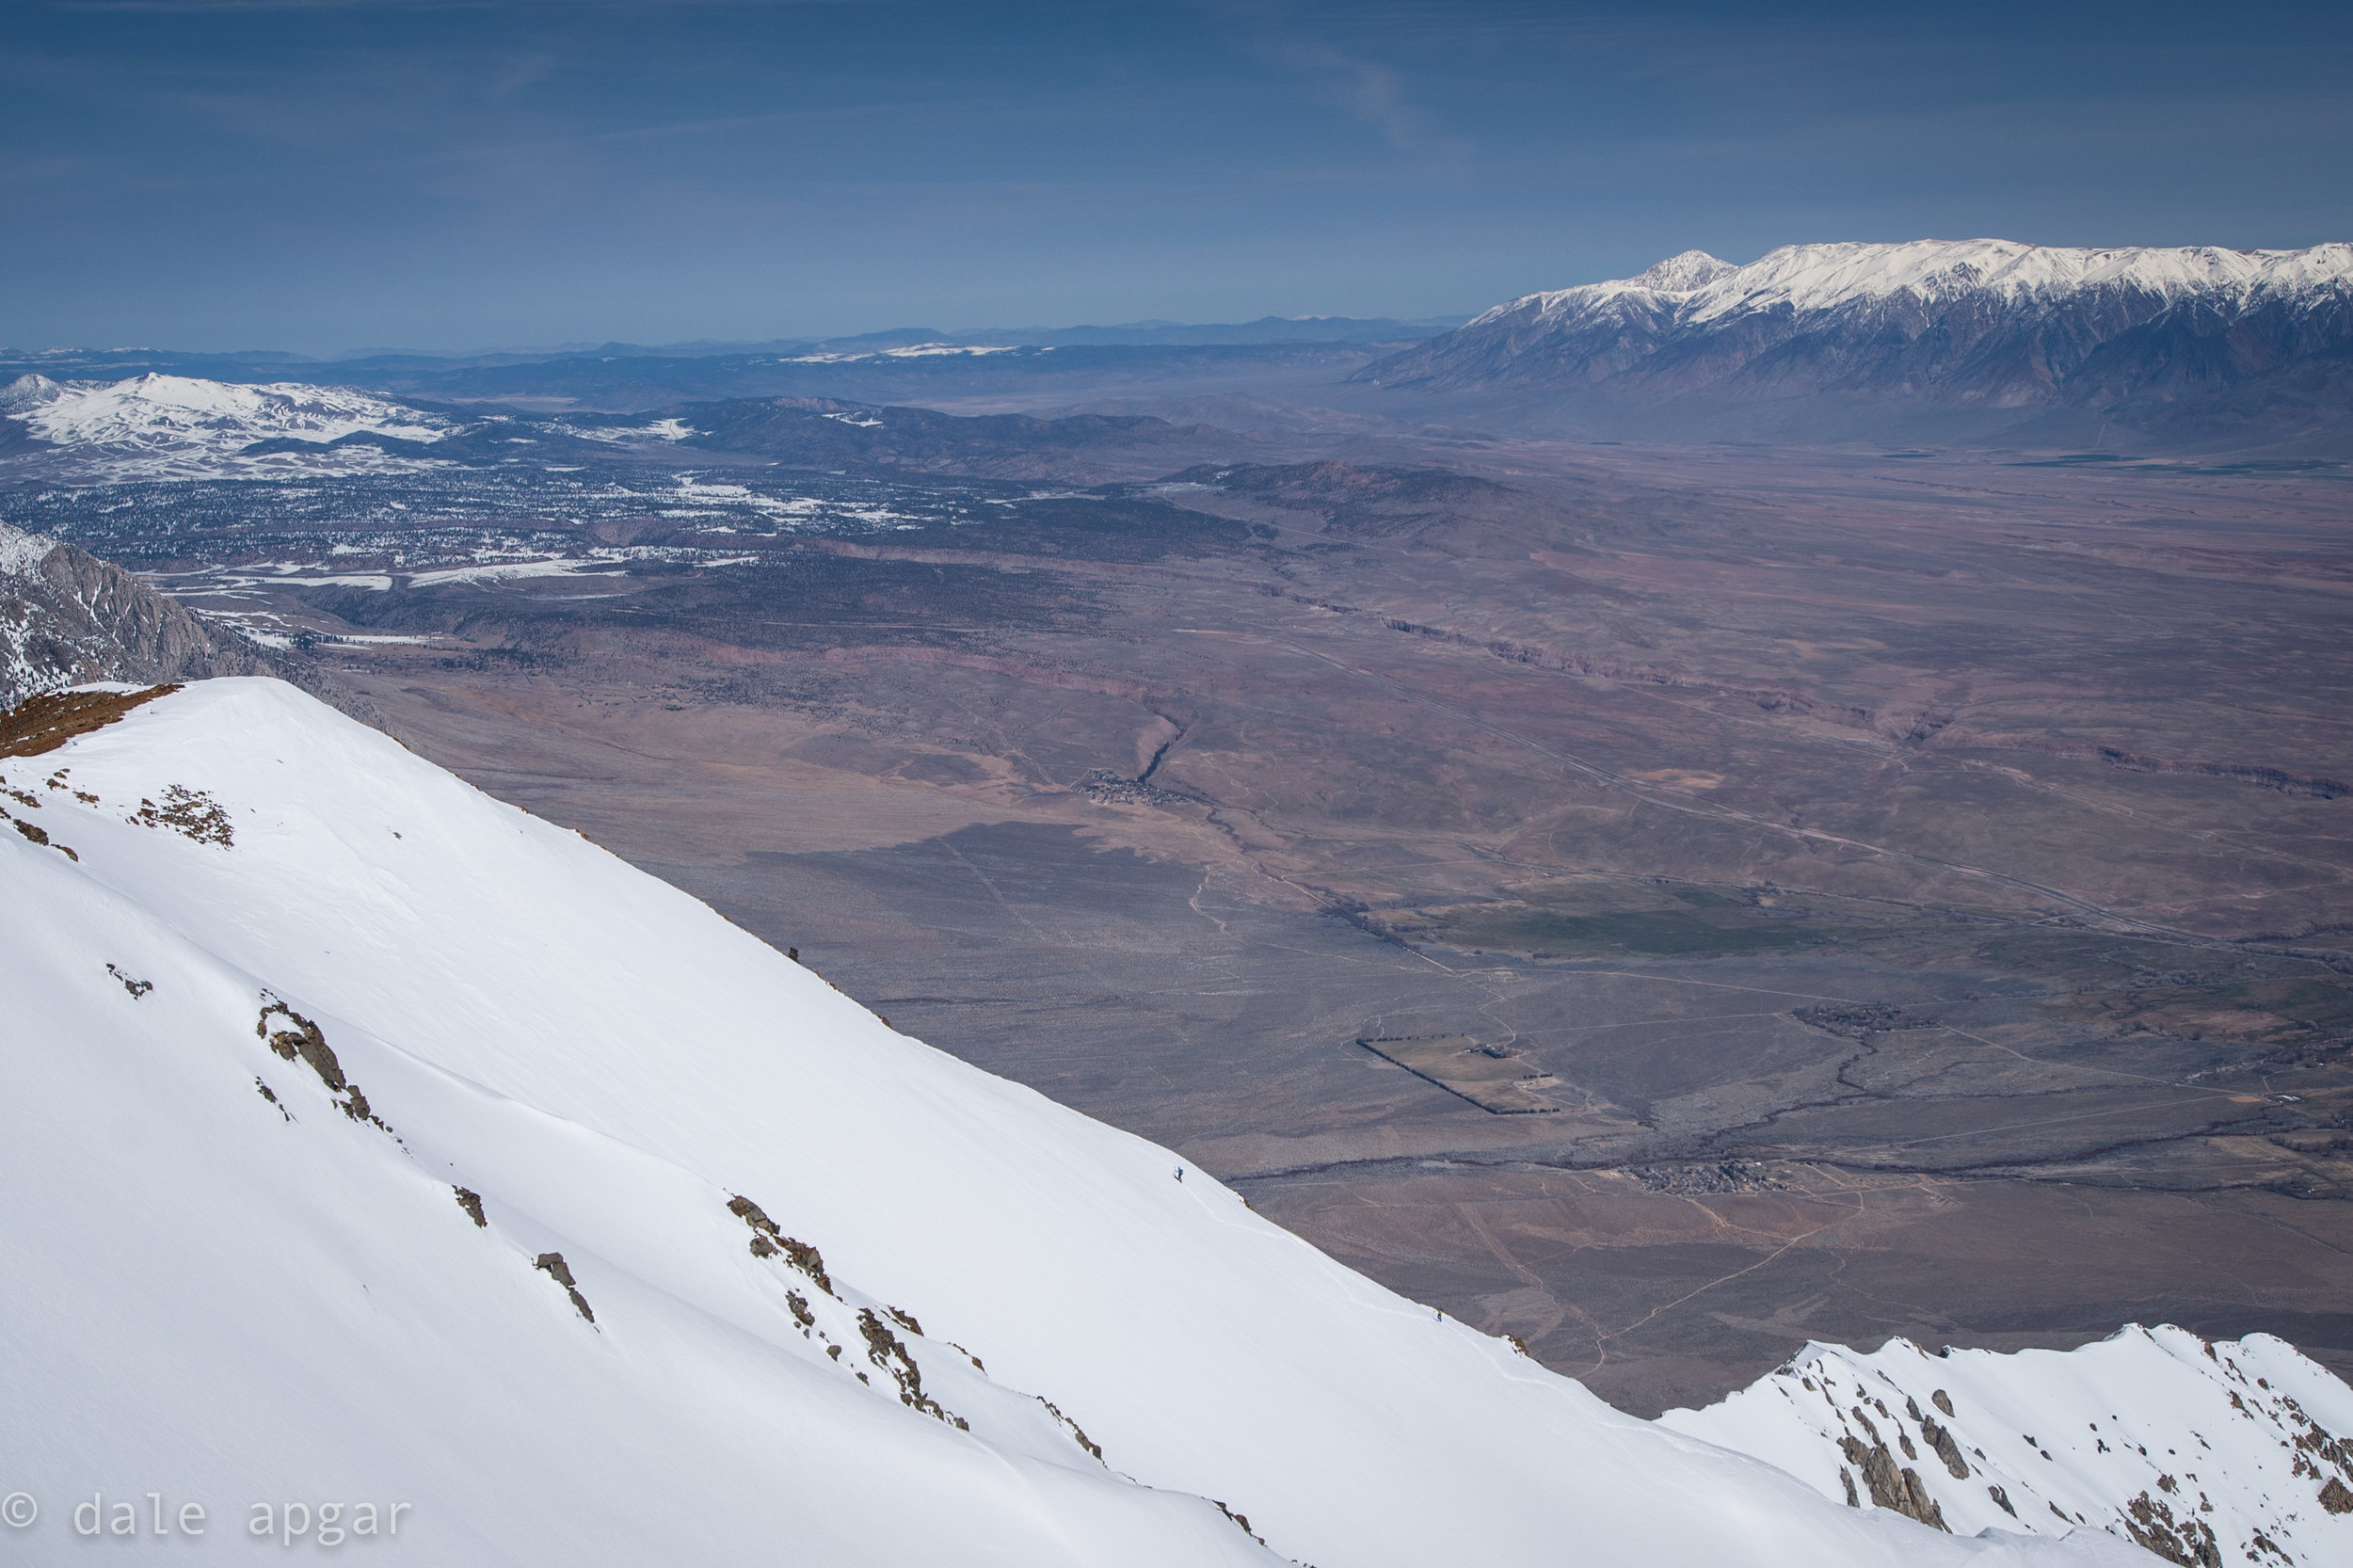 Skiers making progress on Winuba's East Chute